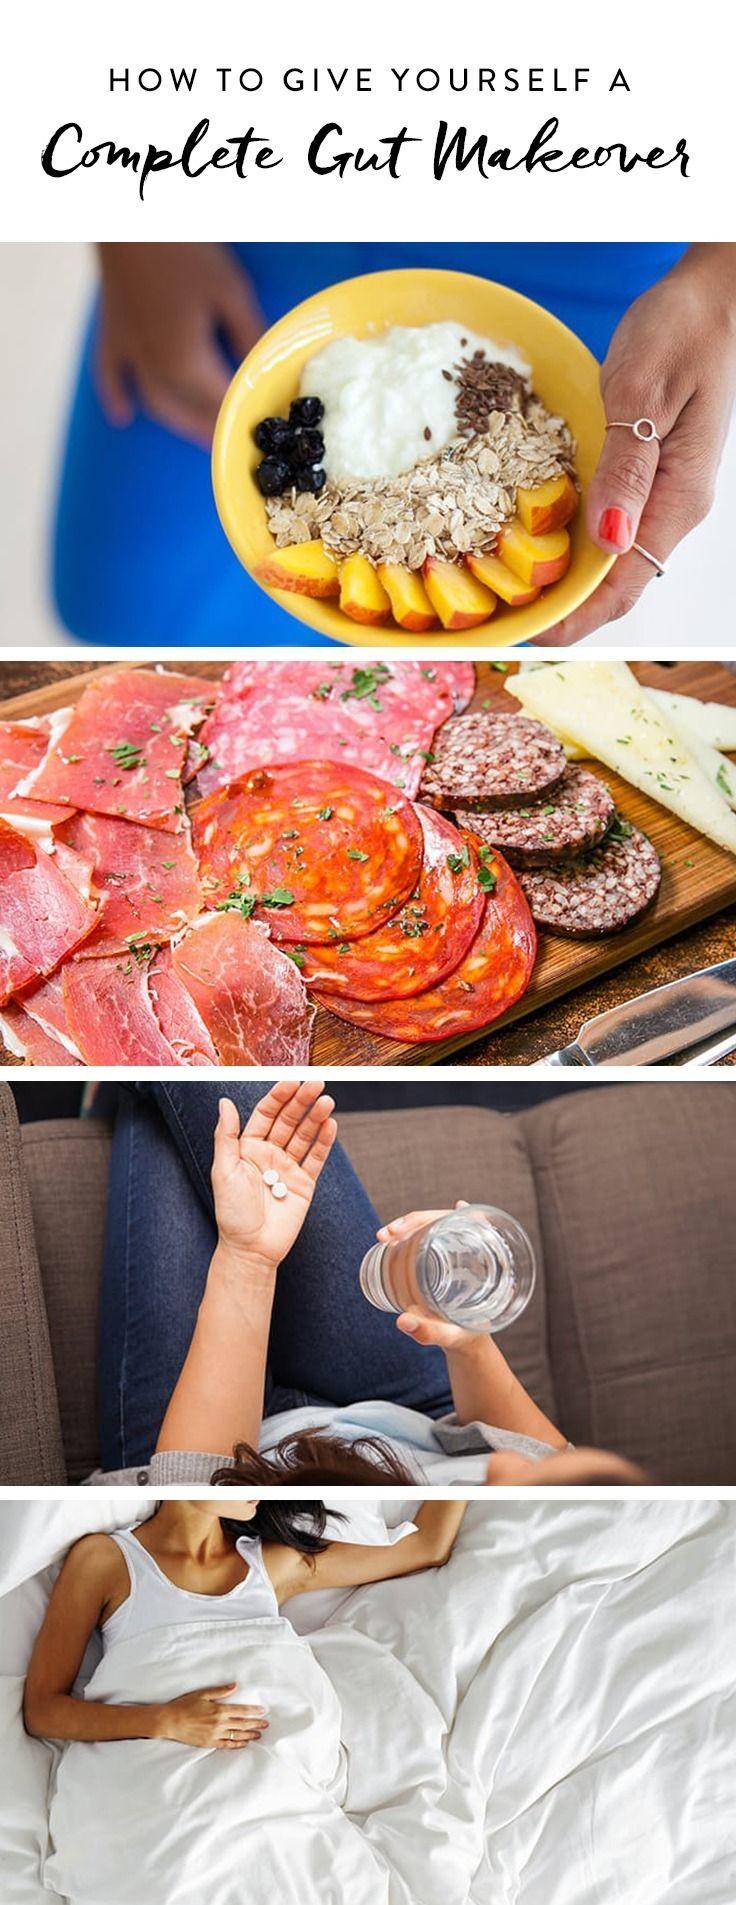 25+ Best Foods To Help Diarrhea Ideas On Pinterest  Diarrhea Diet, Diarrhea  Food And Baby With Diarrhea